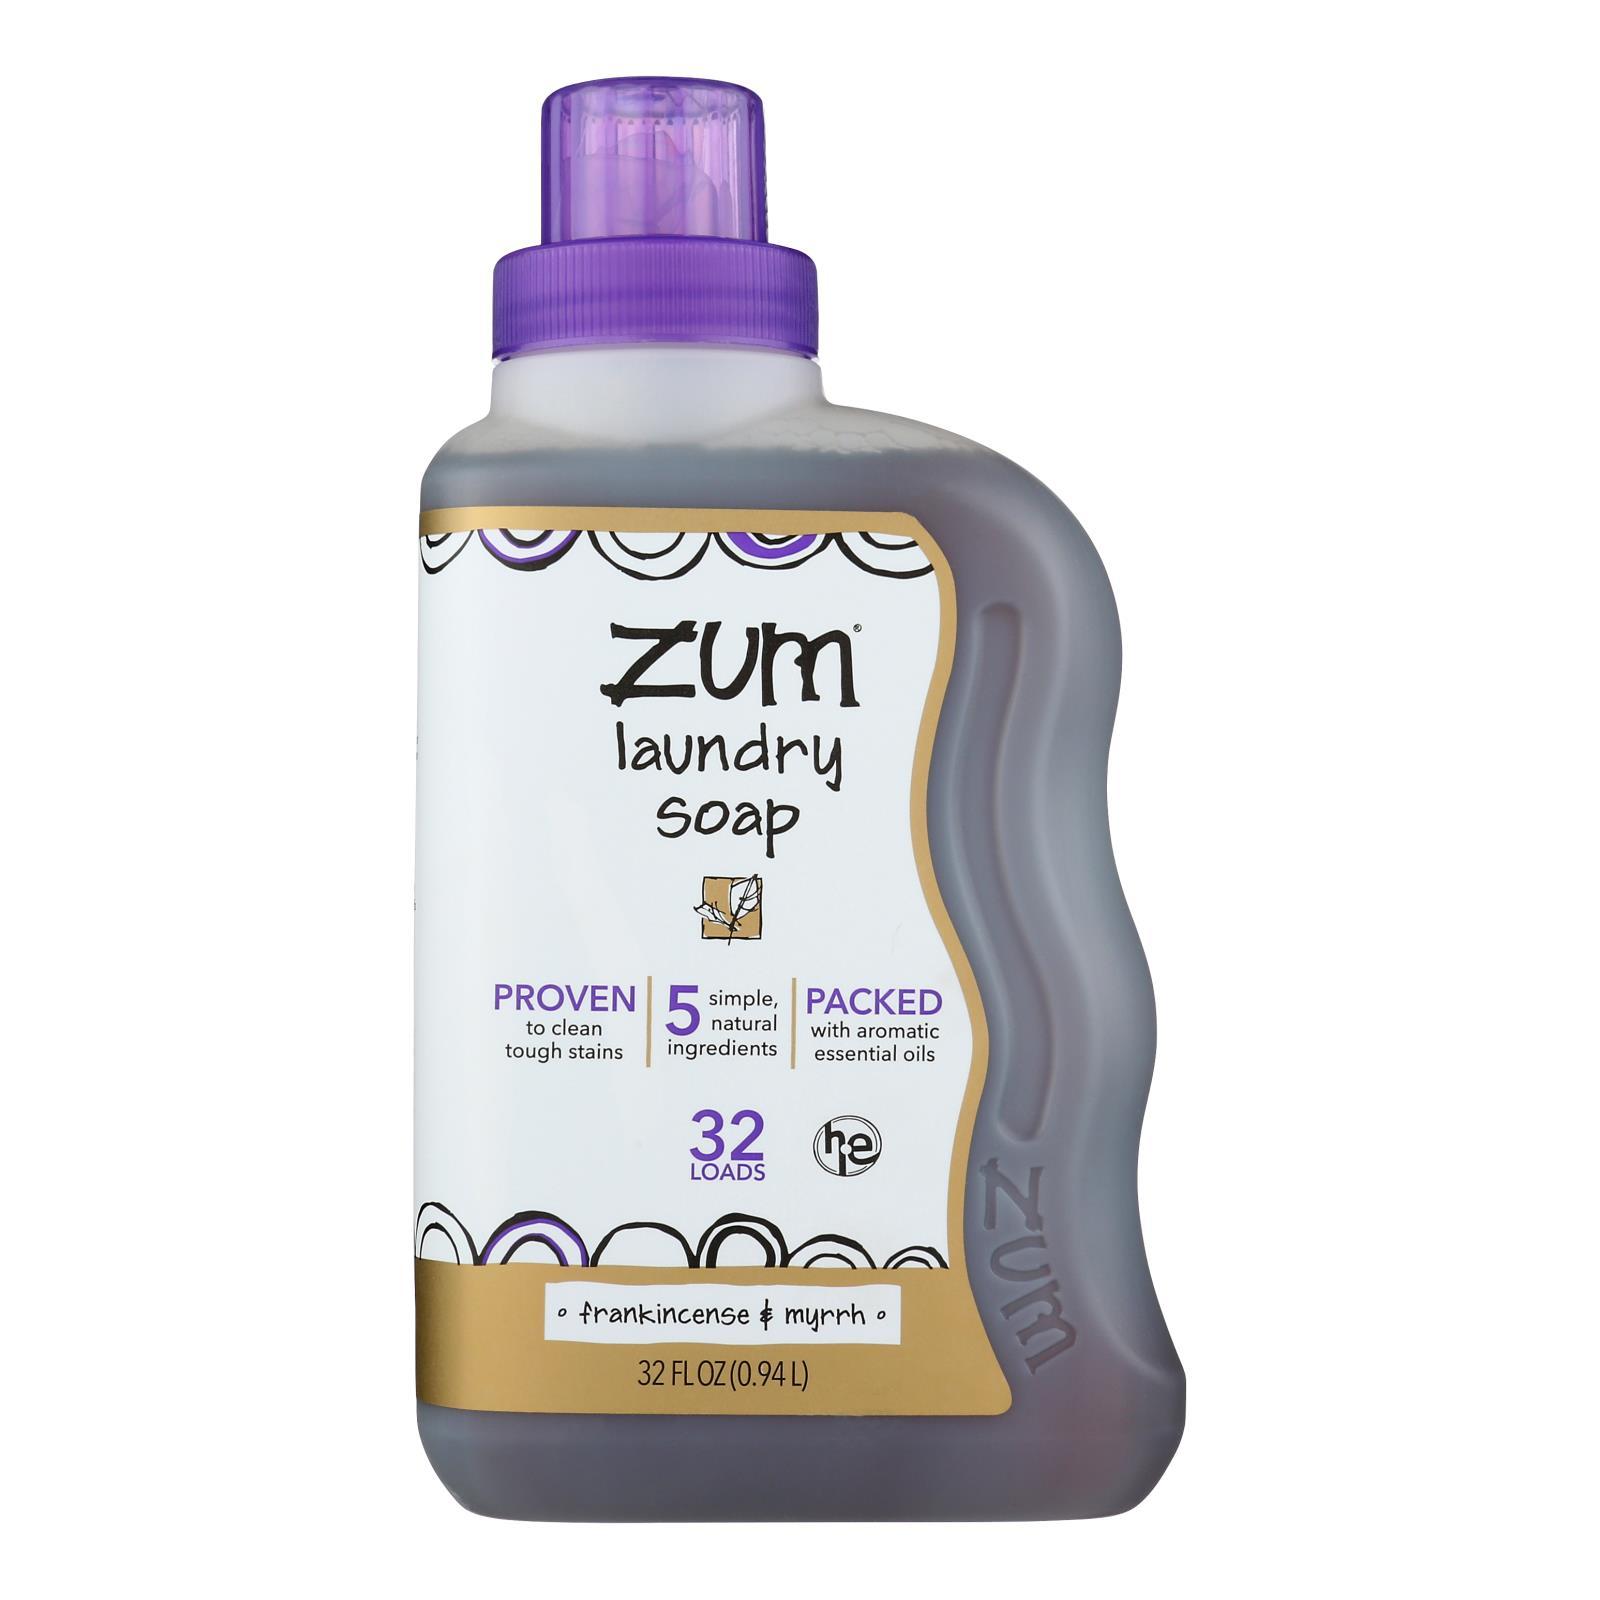 Zum - Clean Laundry Soap - Frankincense and Myrrh - Case of 8 - 32 oz.